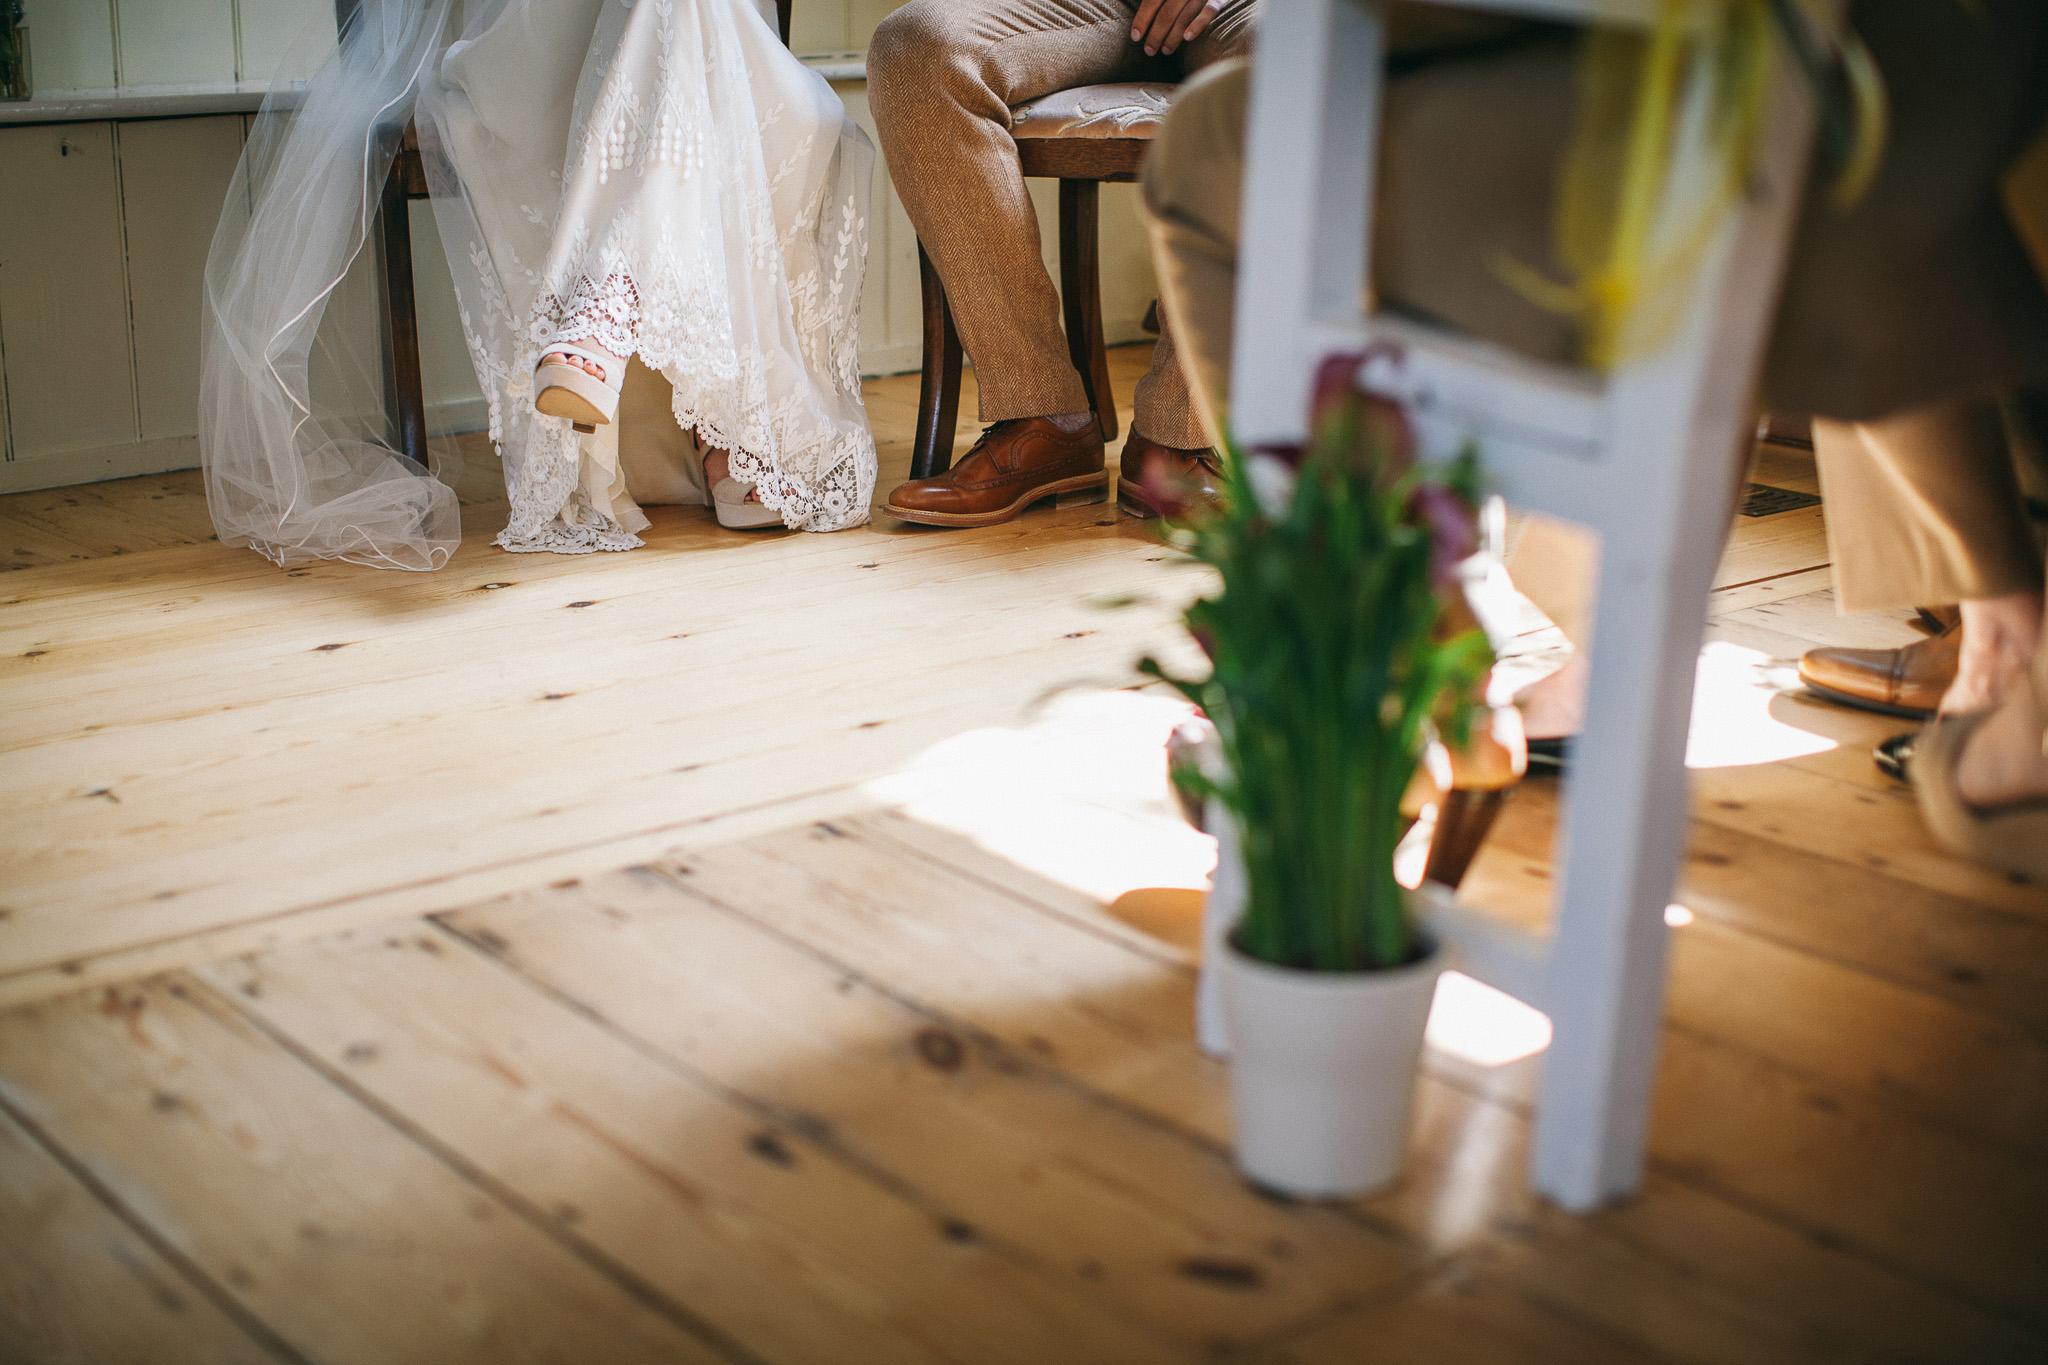 chantry_sussex_barn_wedding_308.jpg